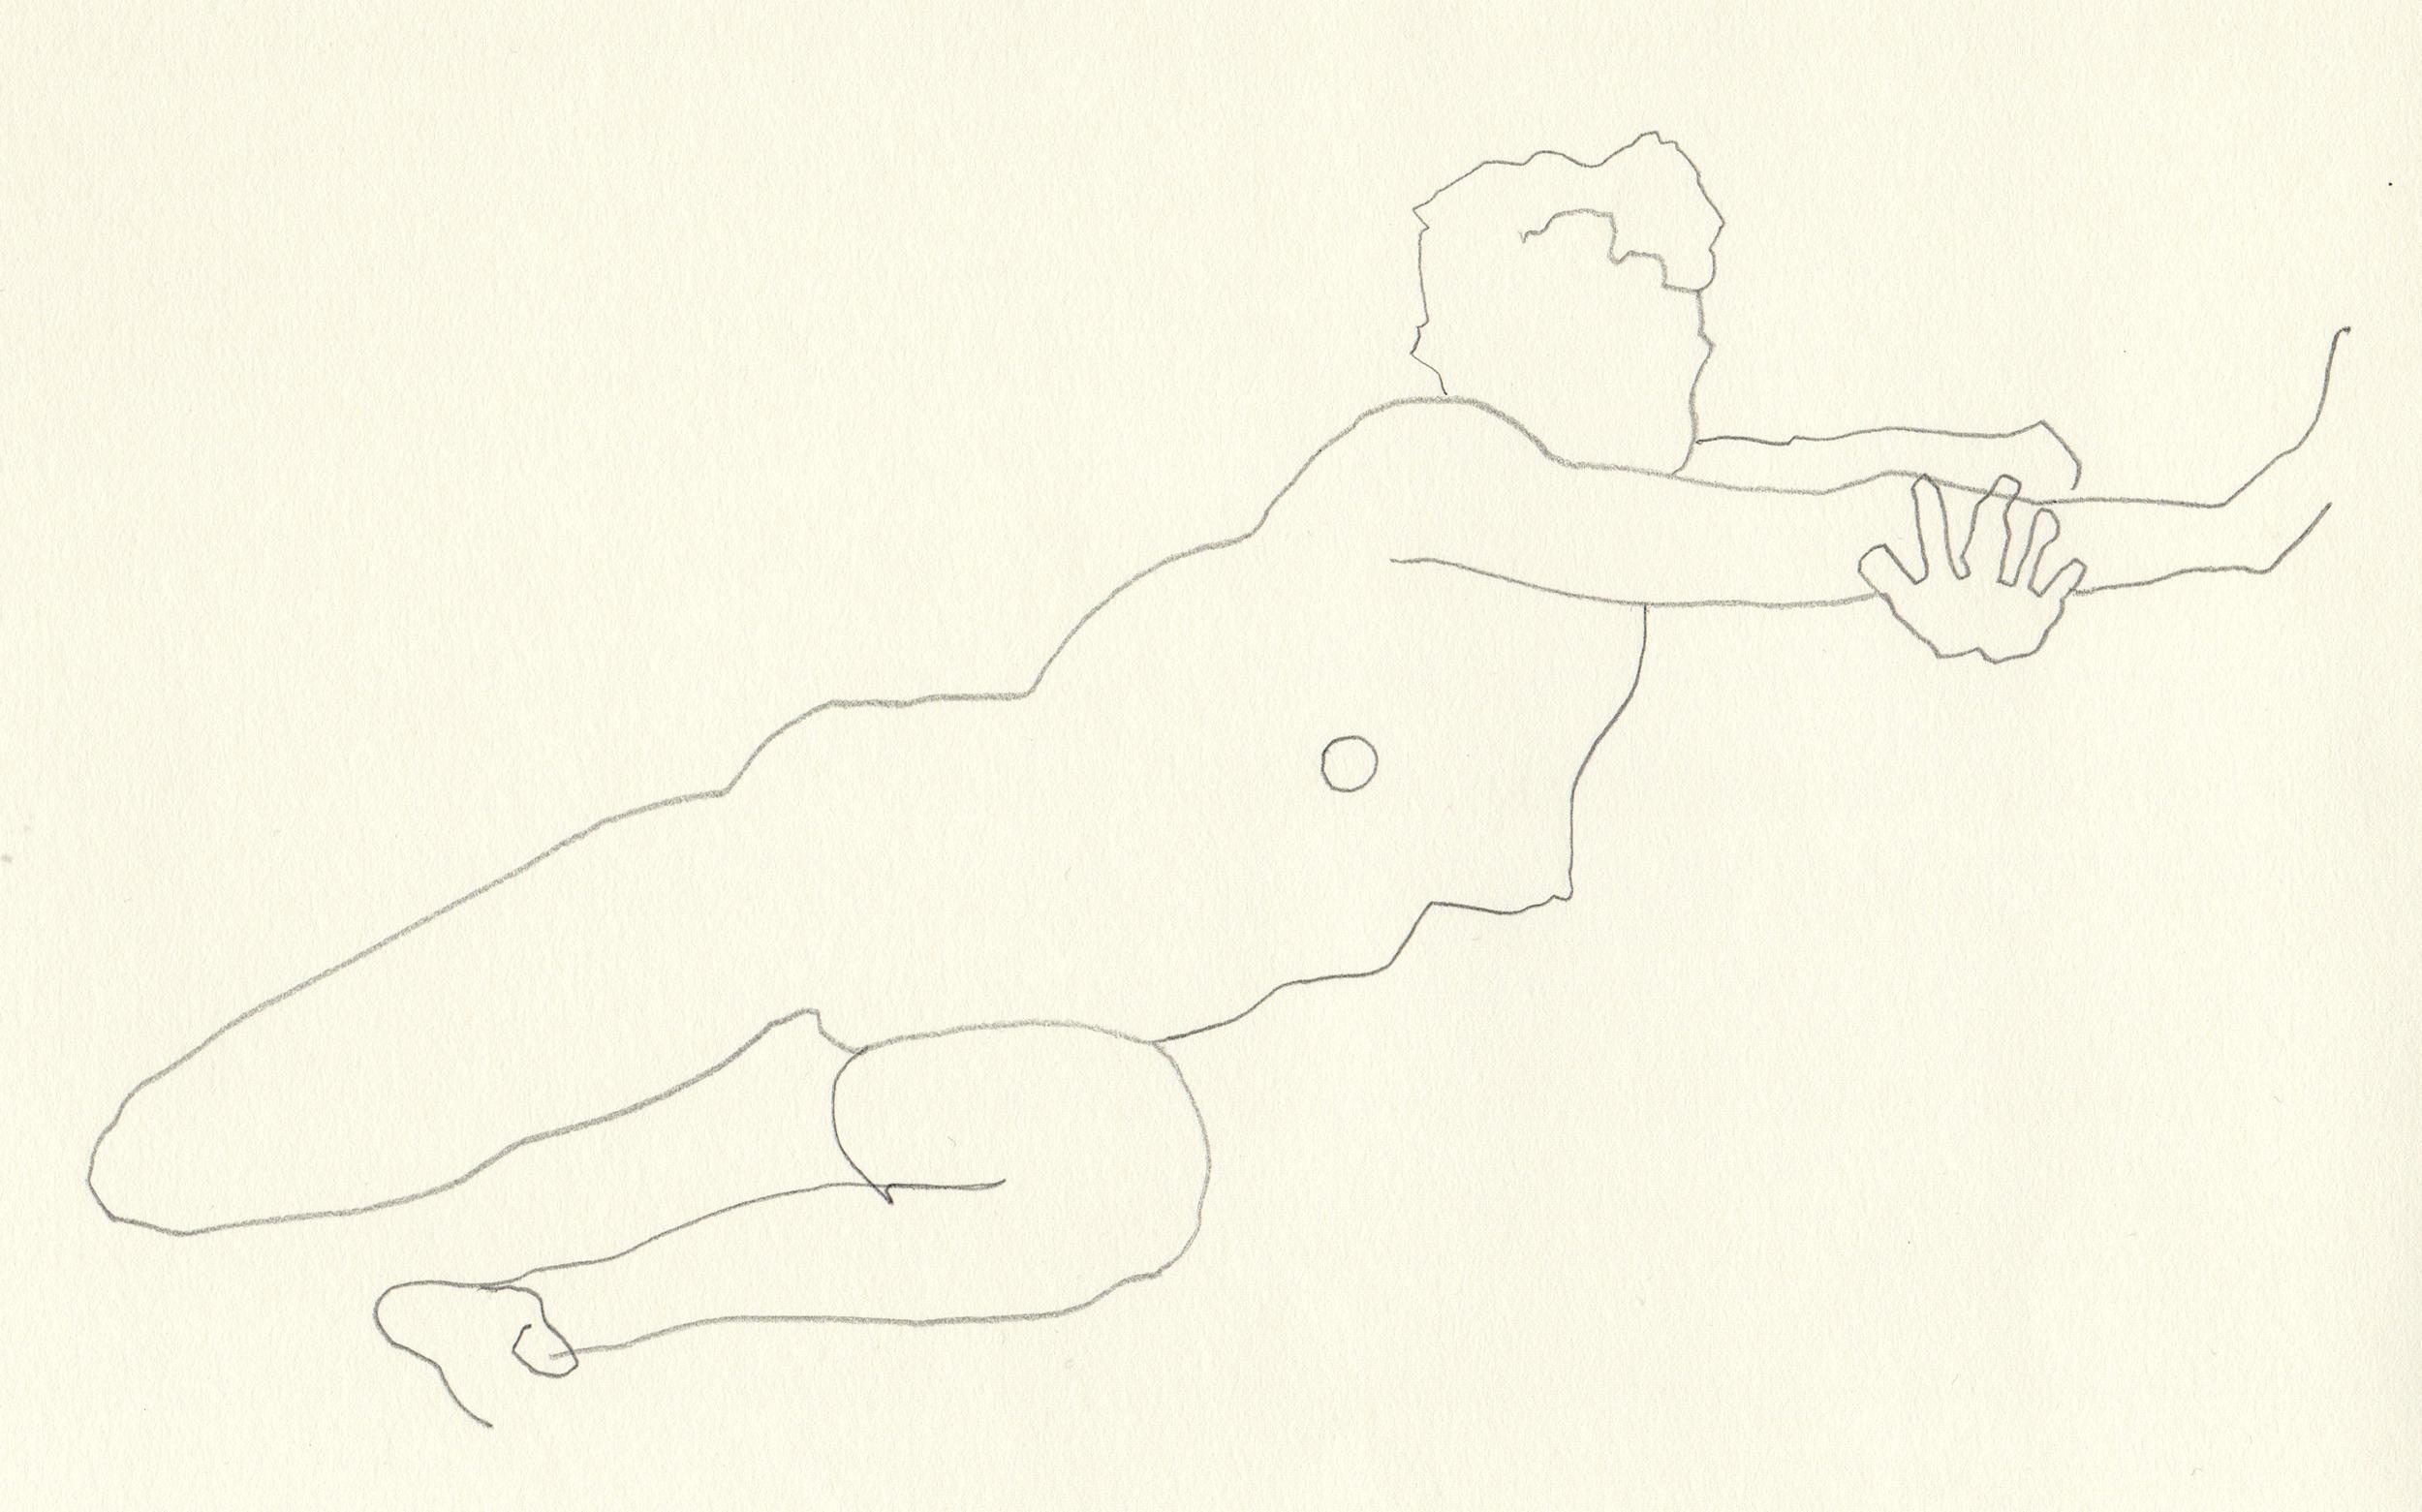 2012_Sketch_F-Beudin_044